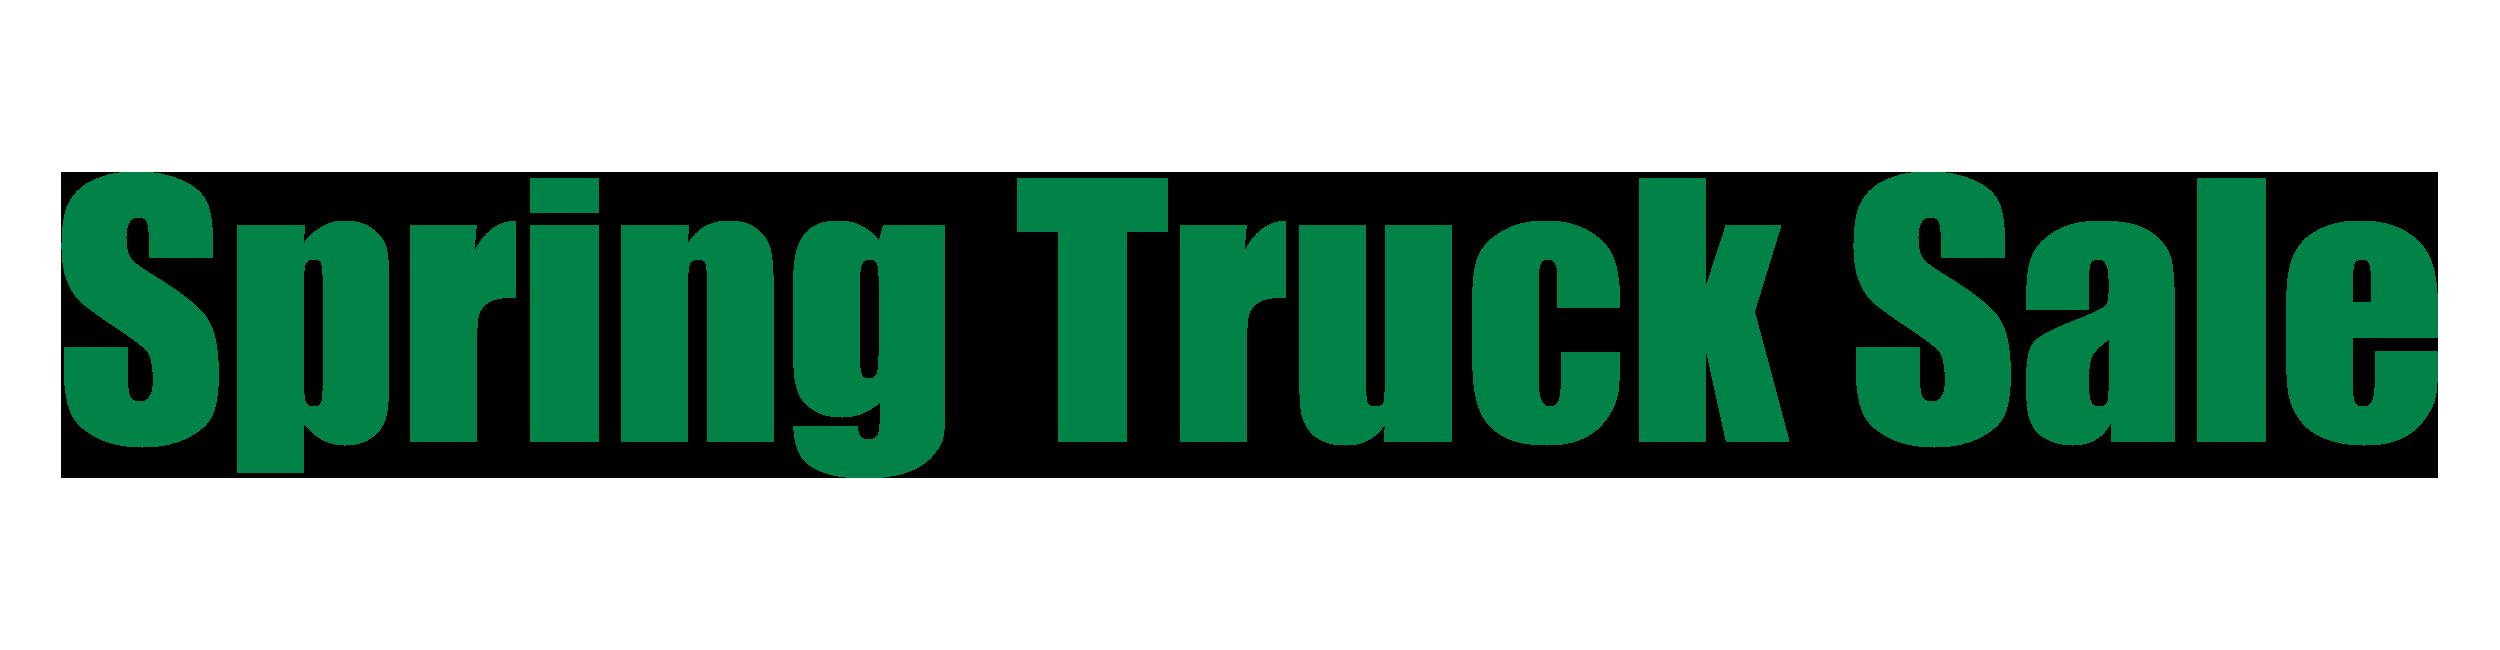 spring-truck-sale-logo